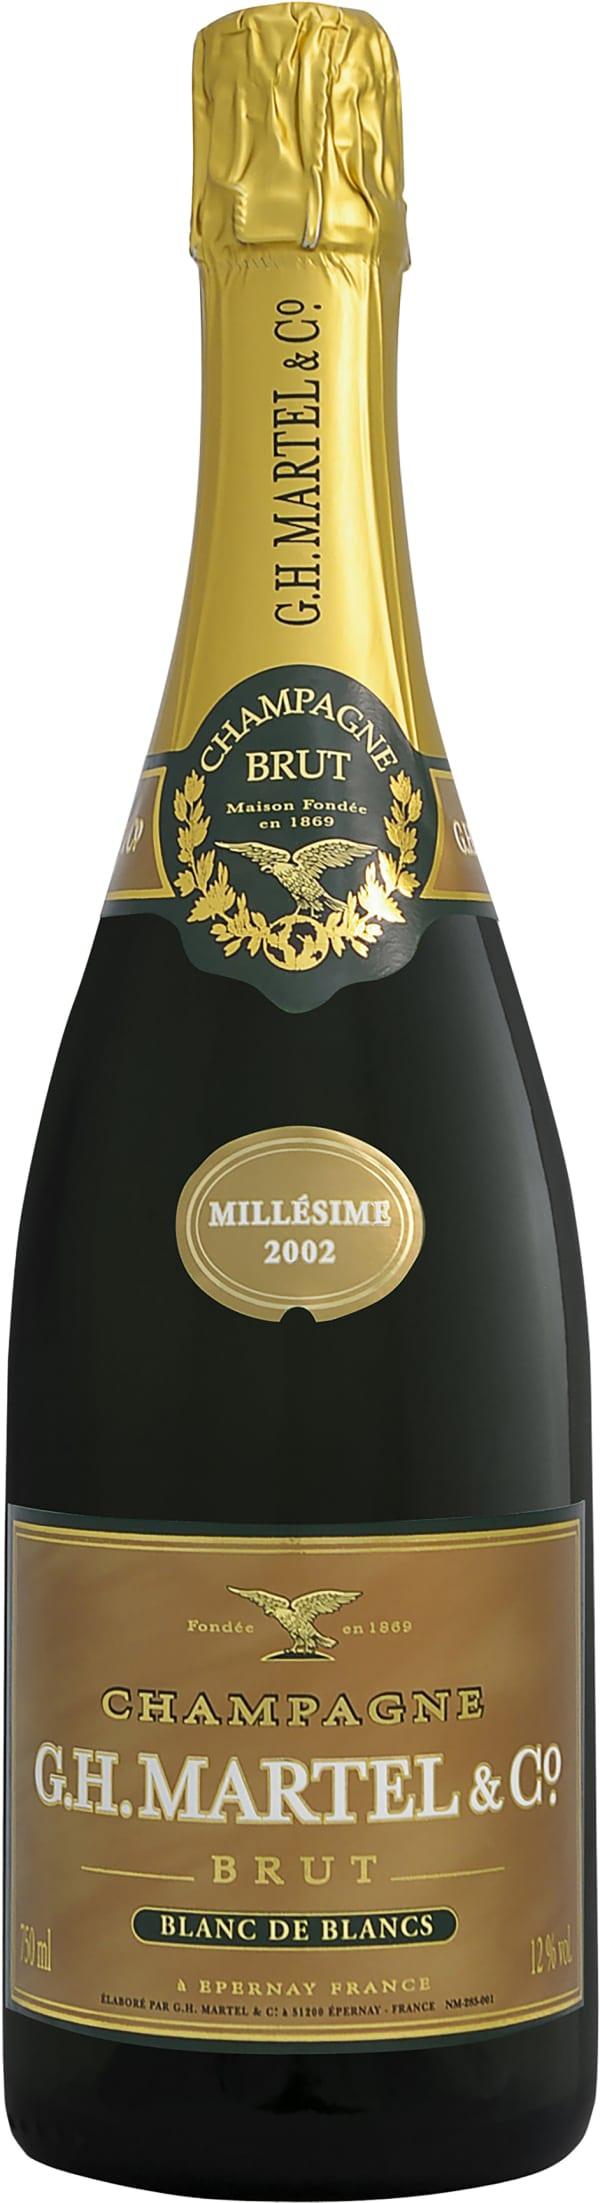 G.H. Martel Blanc de Blancs Champagne Brut 2002